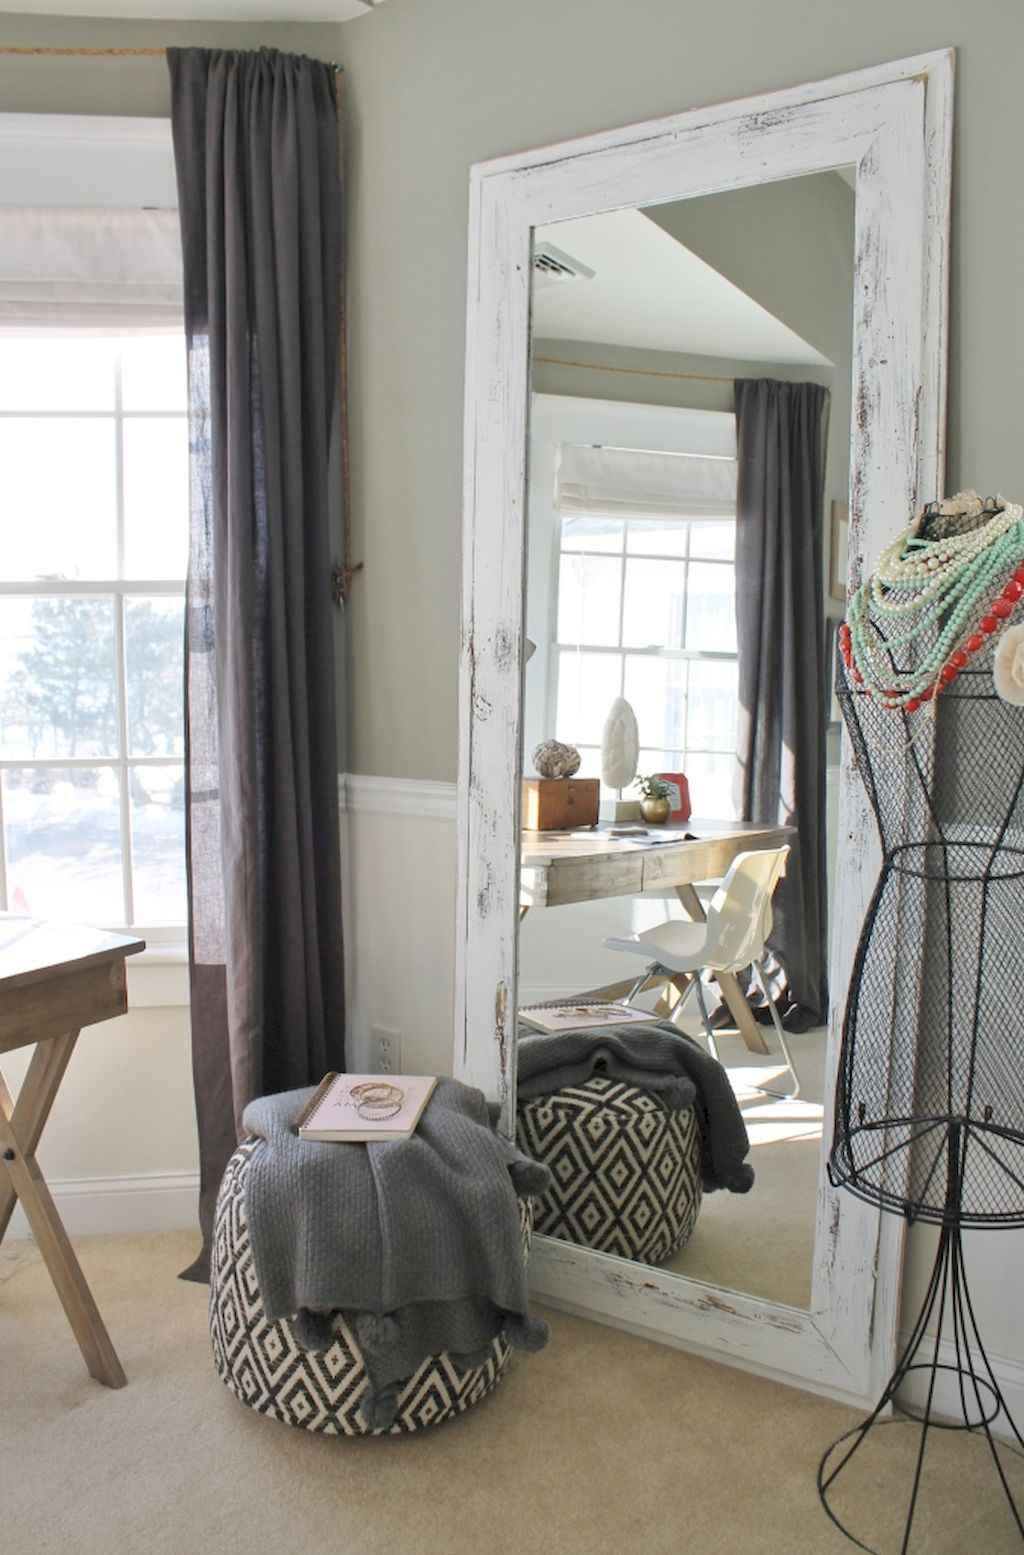 Incredible master bedroom ideas (35)